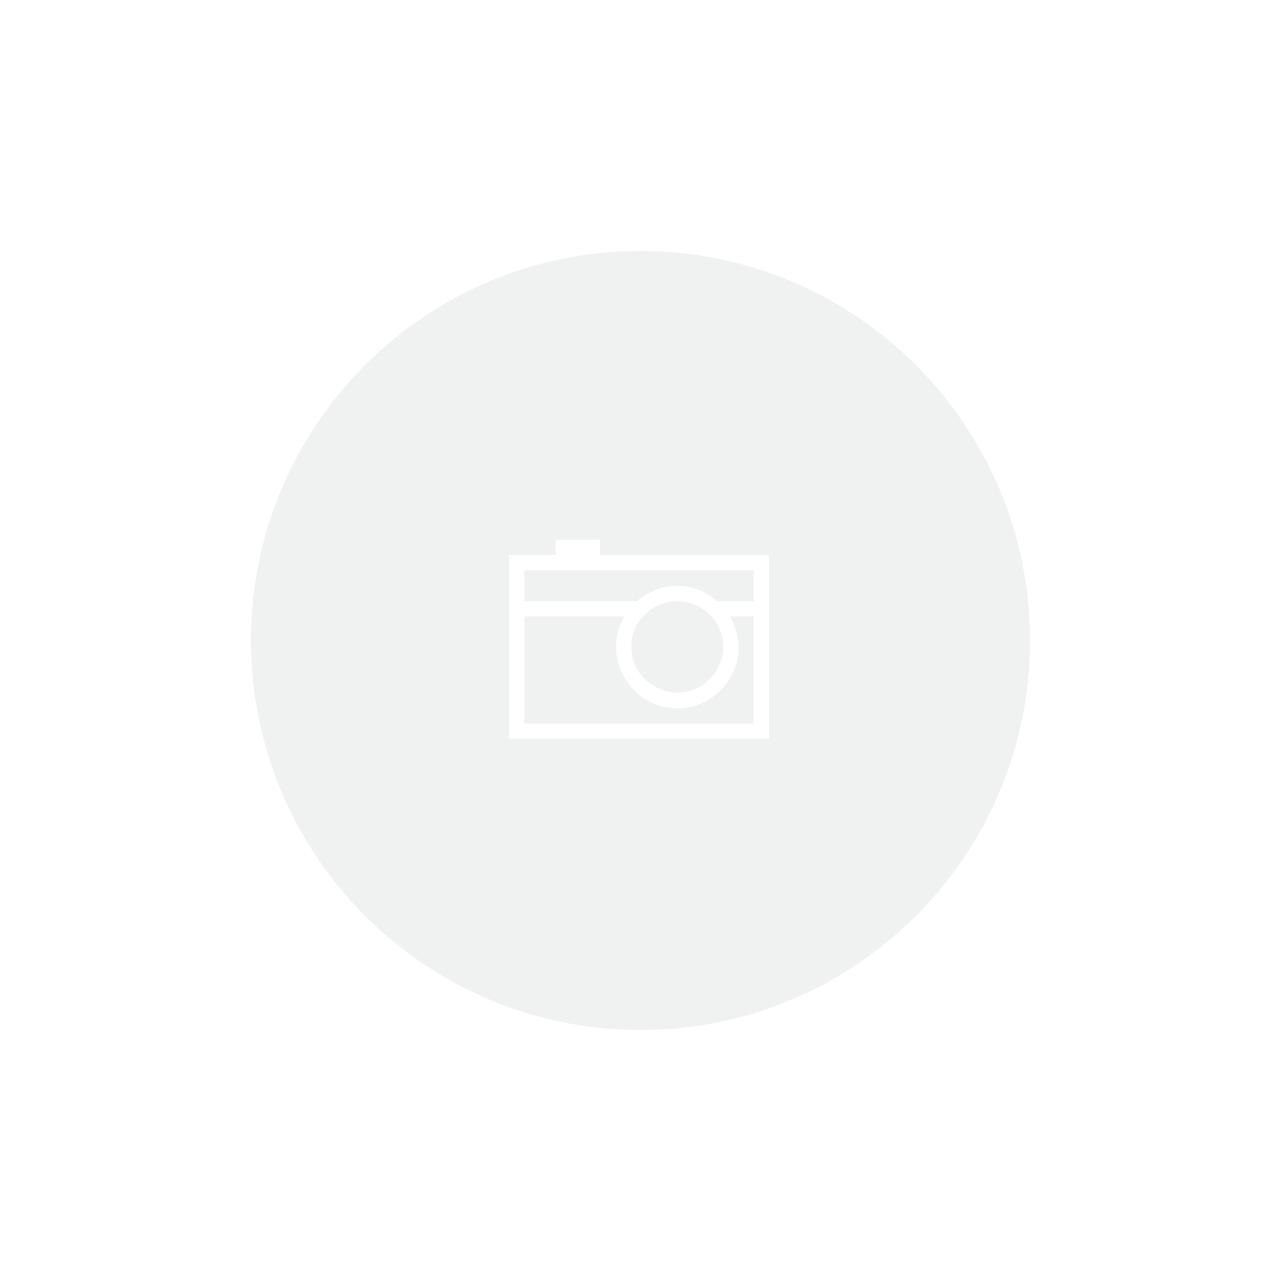 BICICLETA SPEED BMC SLR01 ONE 2018 22V SRAM RED